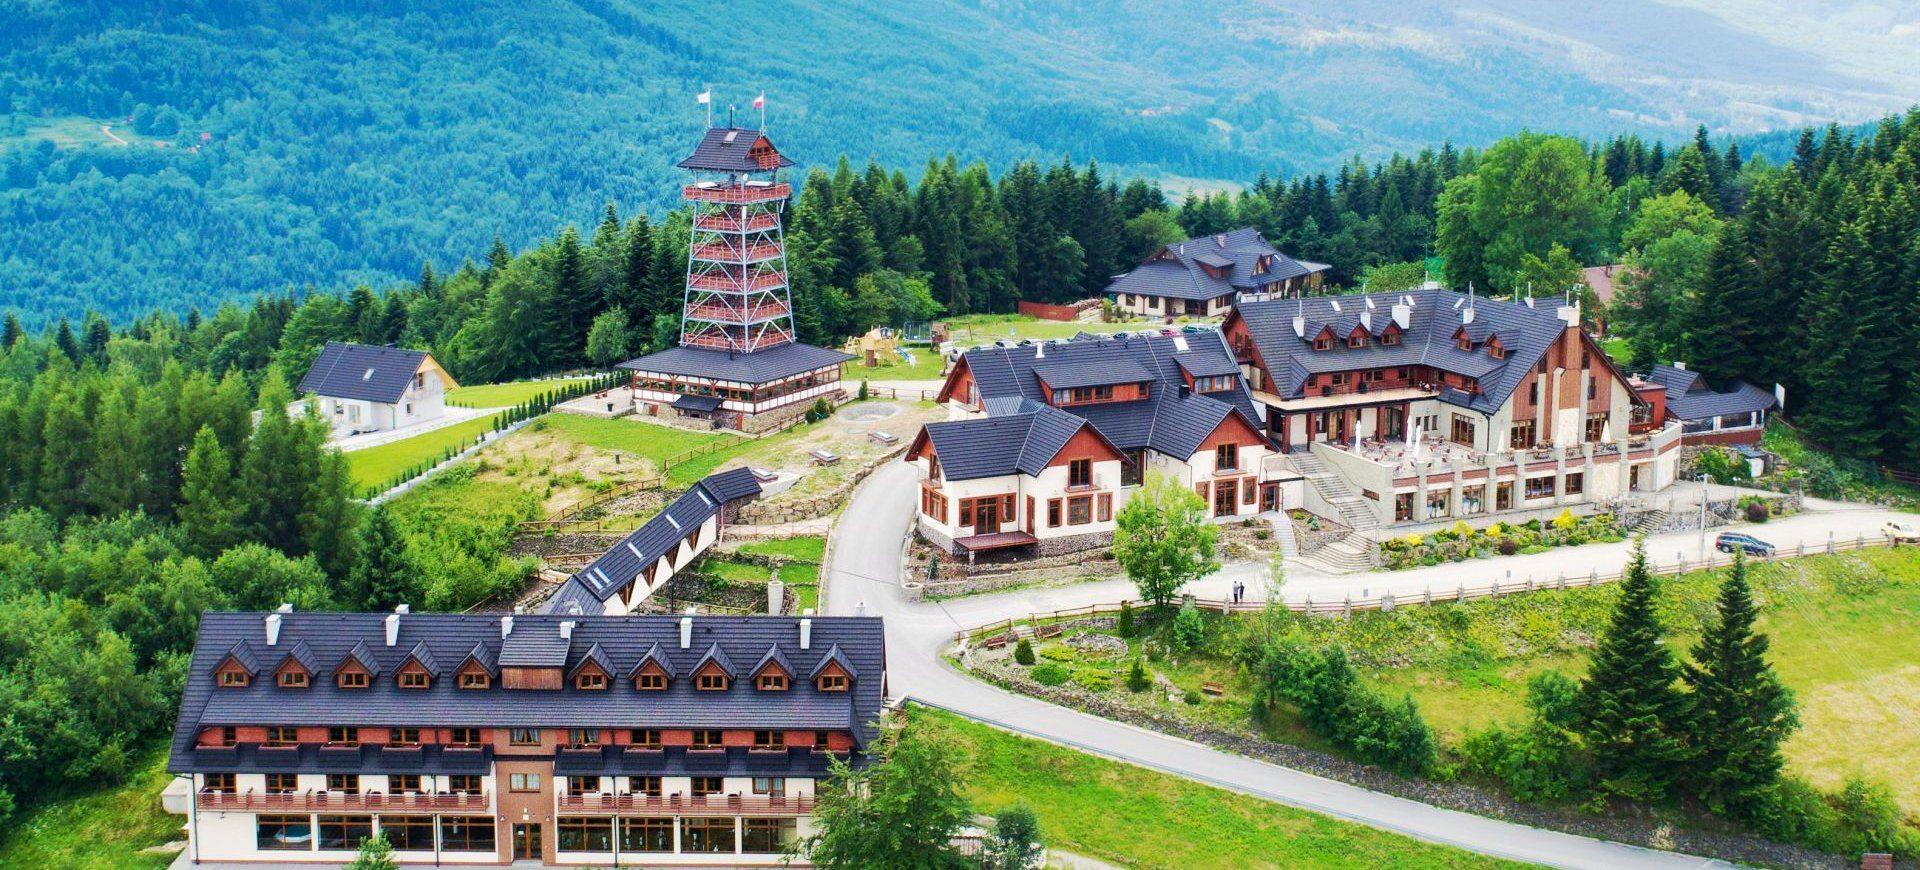 Hotel*** Beskidzki Raj, Stryszawa, Zawoja